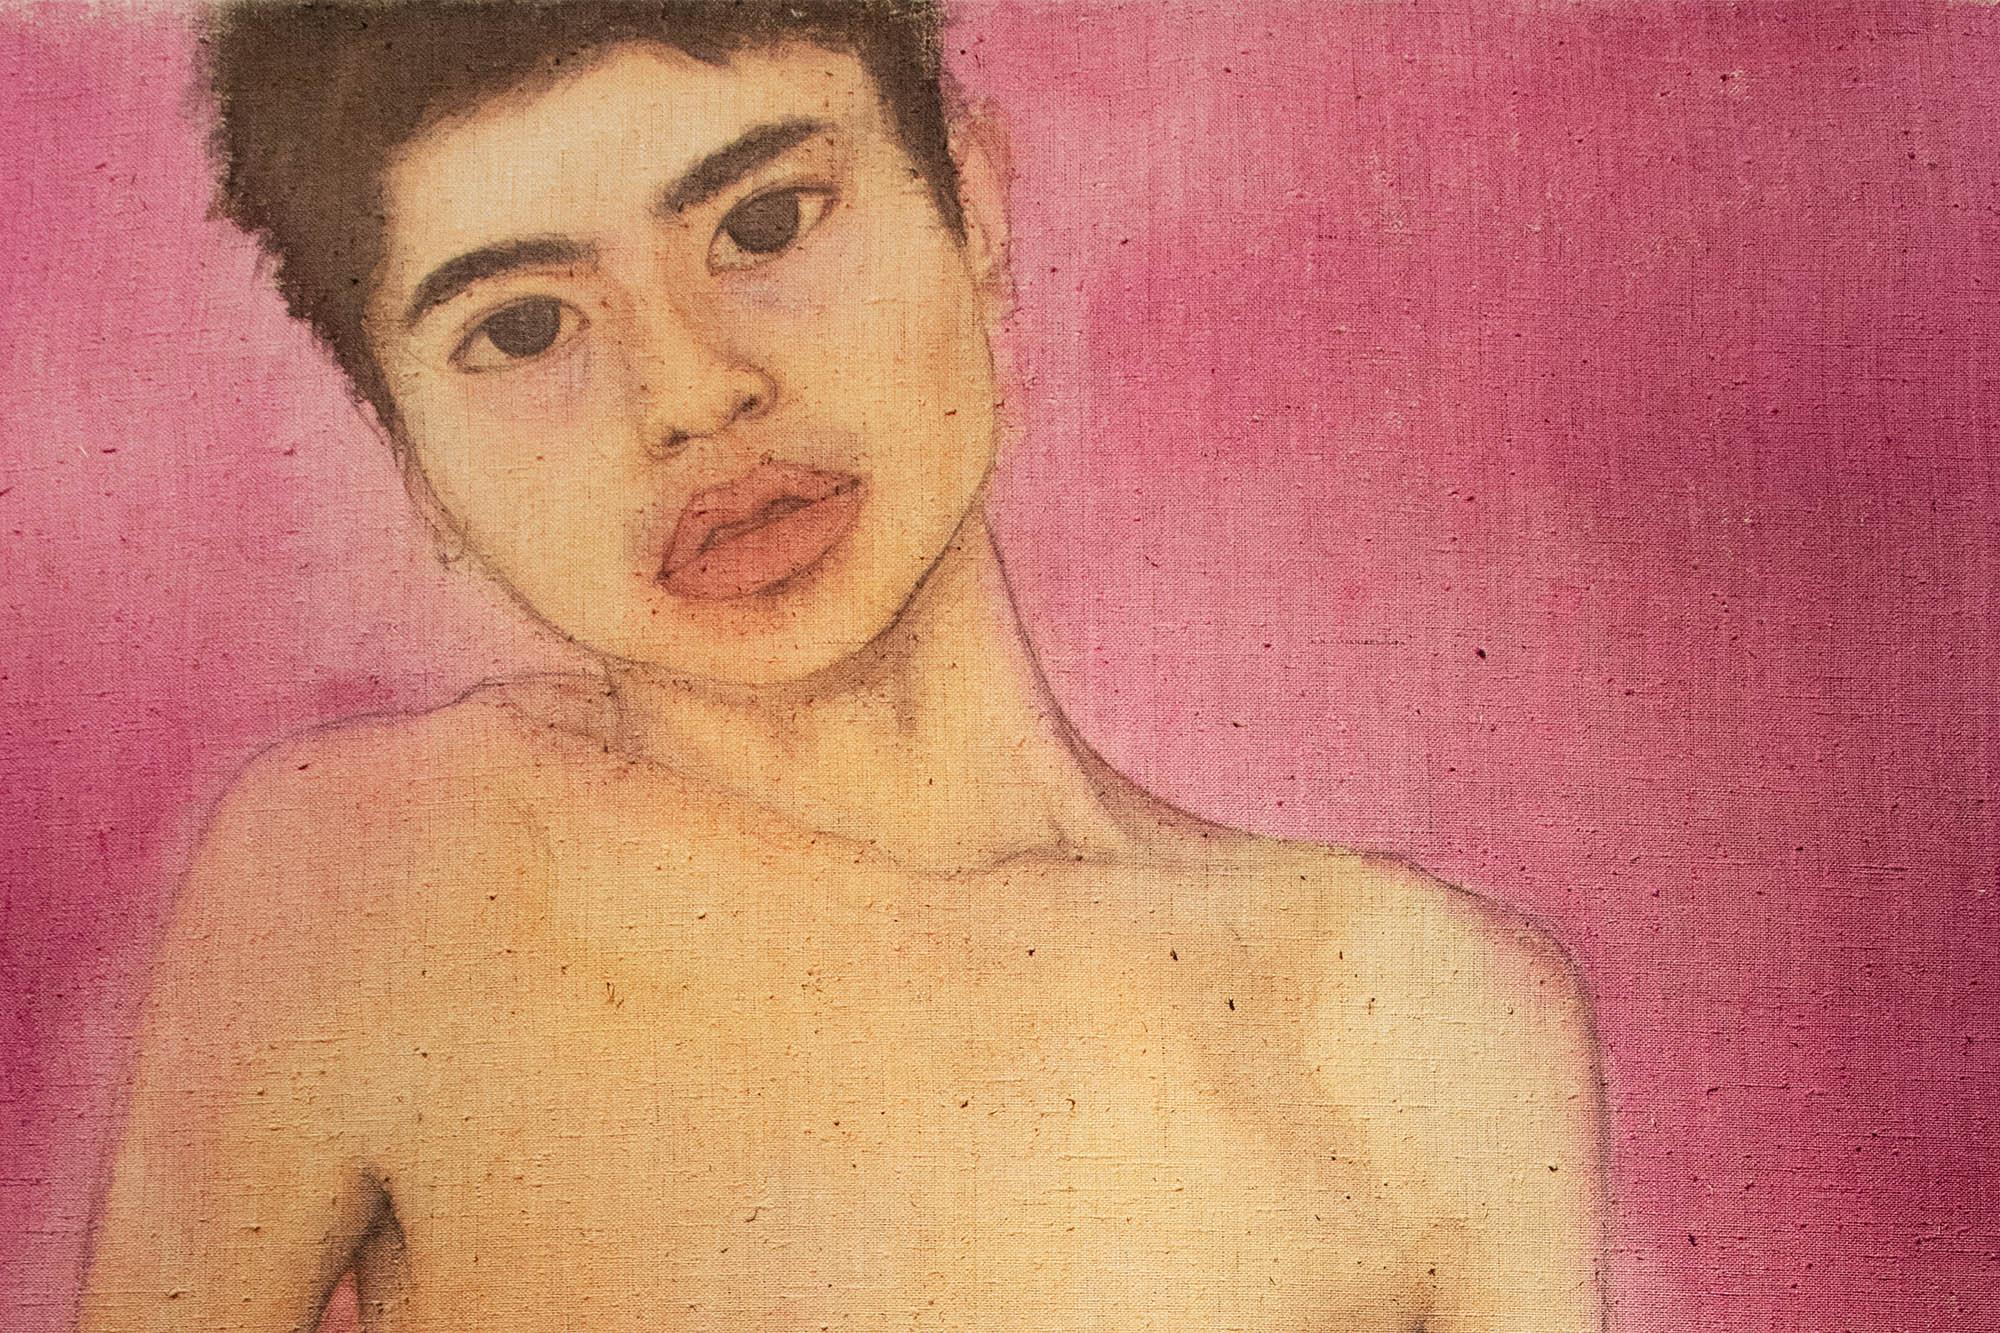 Artwork by Stanley Chen